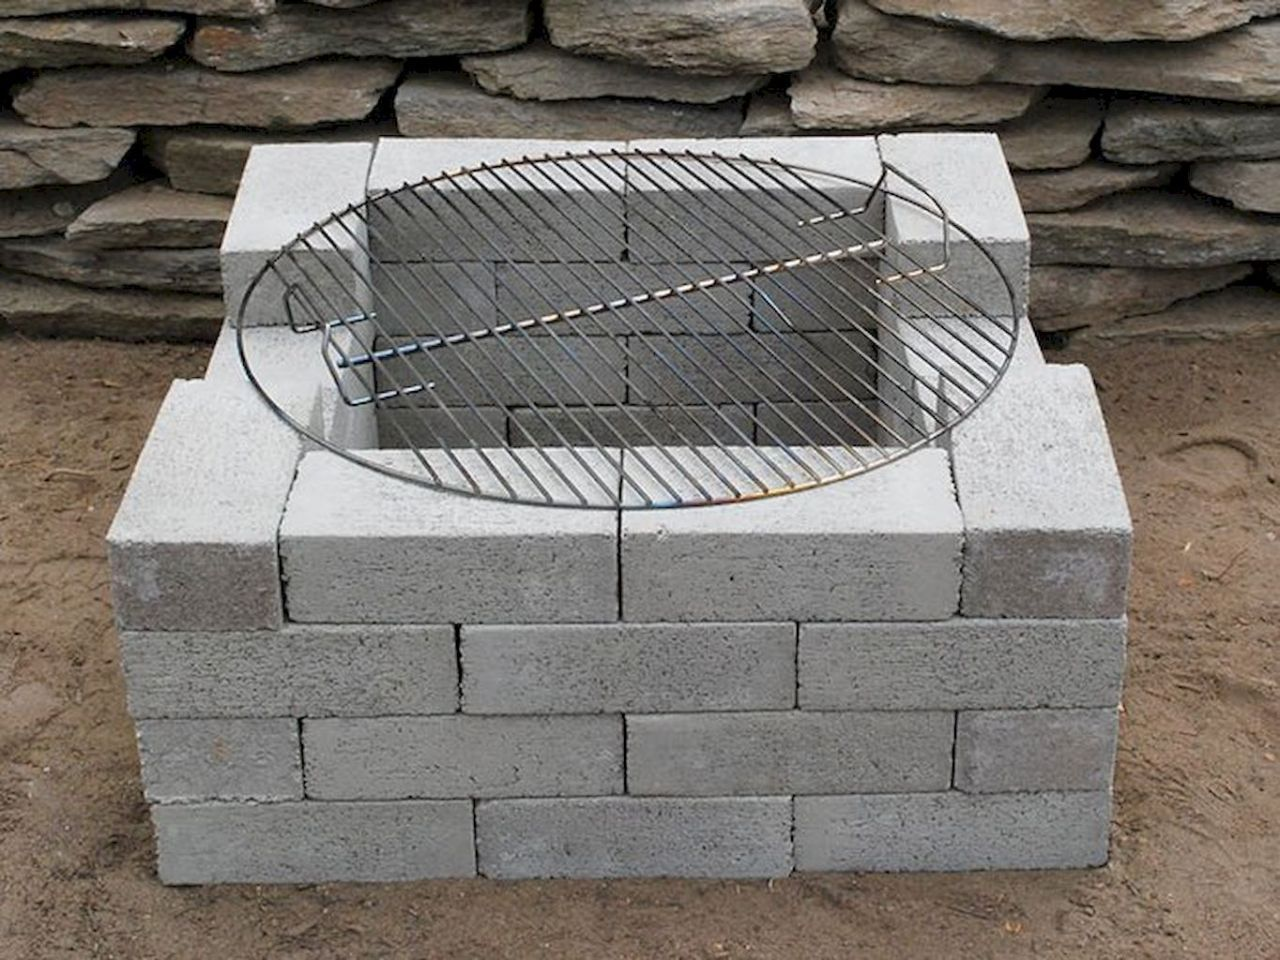 DIY Cinder Block Home Decor Ideas 64   Cinder block fire ... on Cinder Block Fireplace Diy id=47980